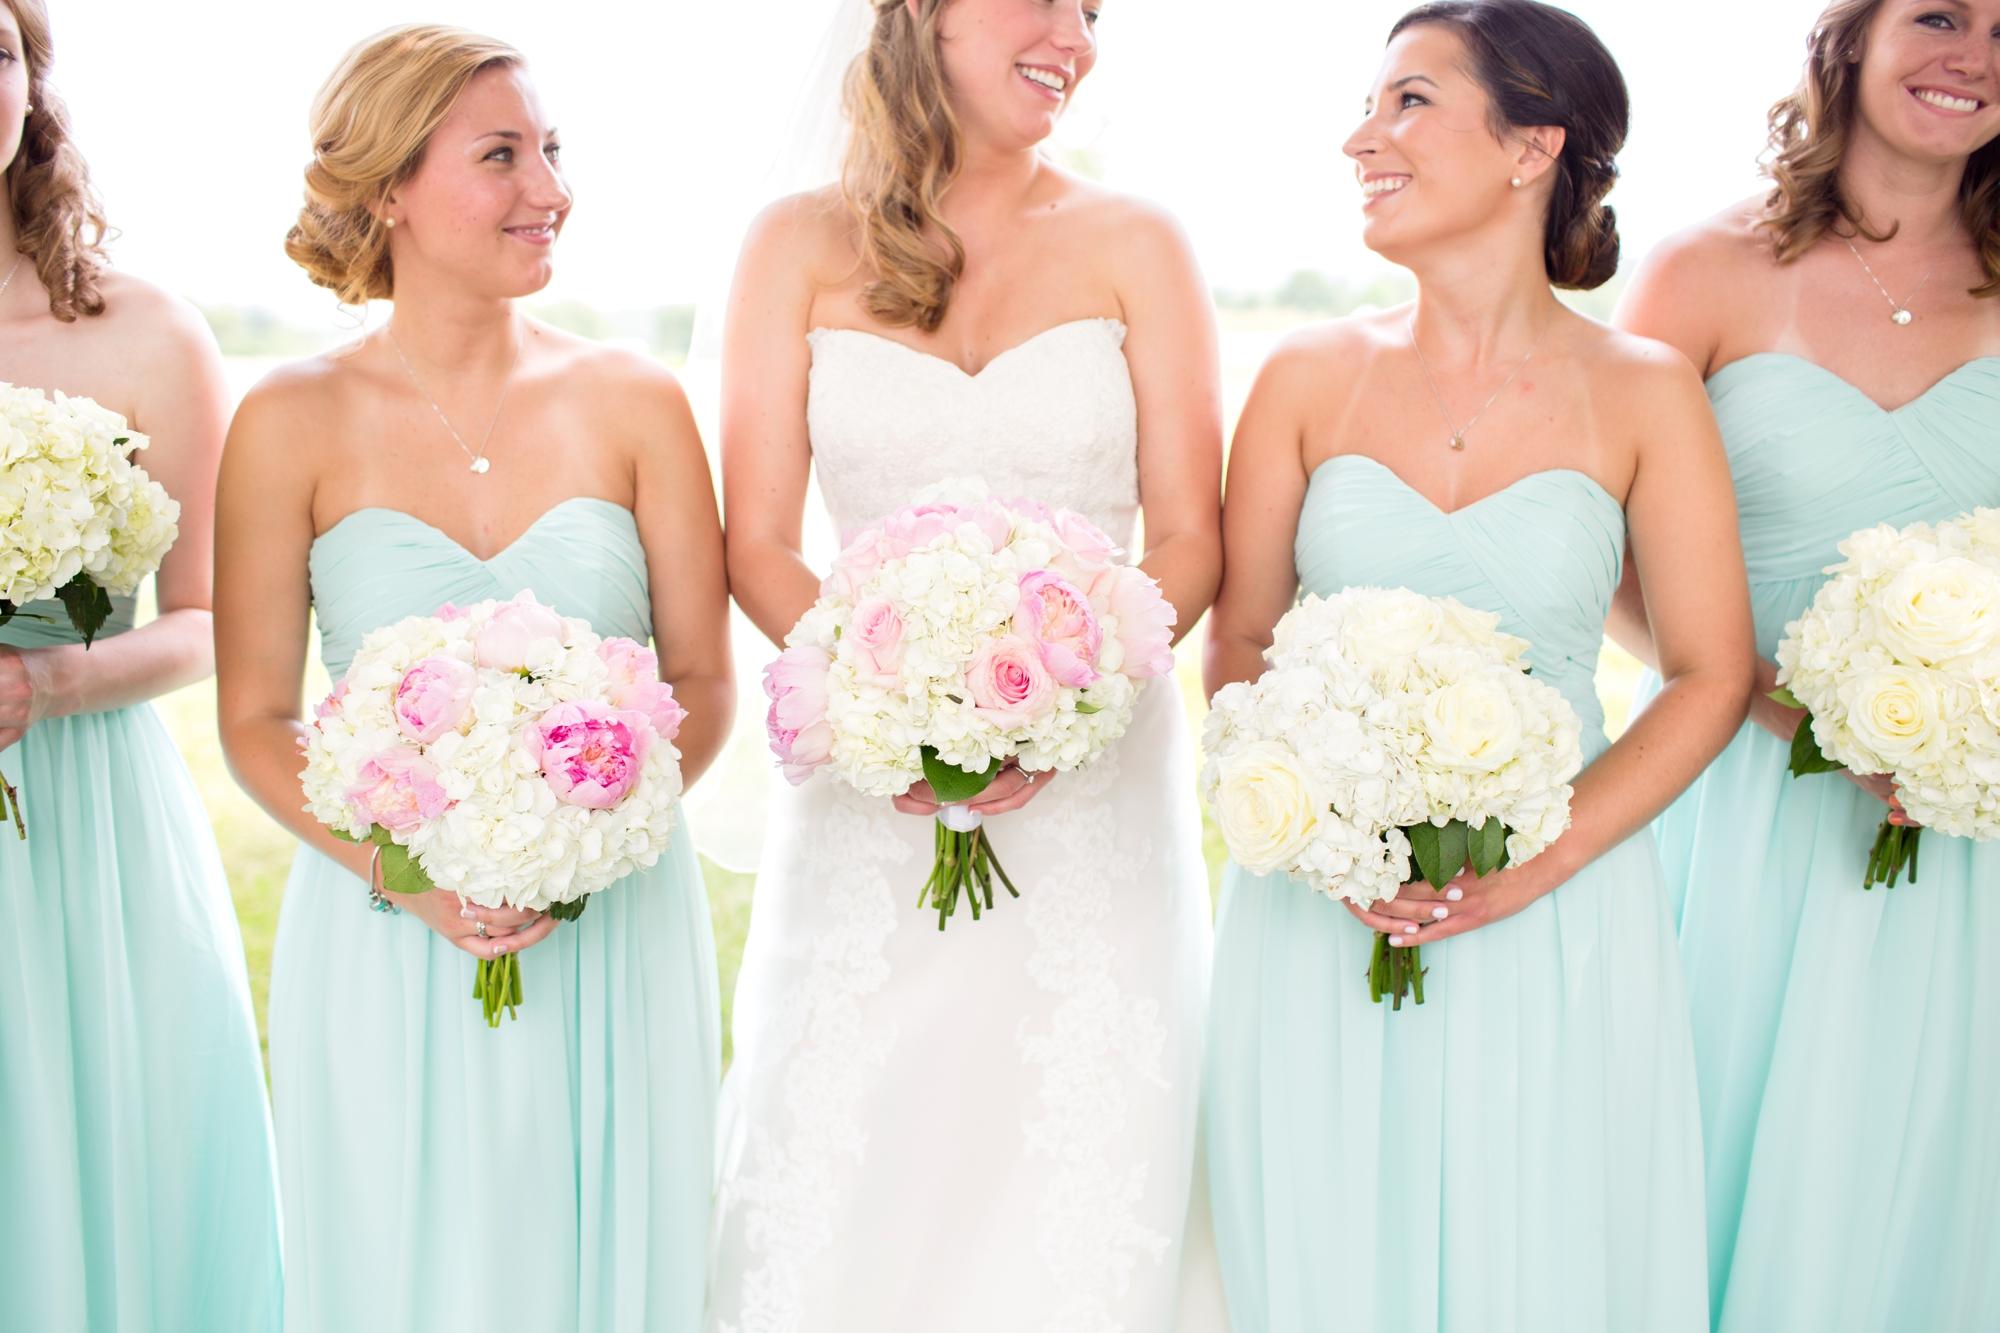 2-Banal Wedding Bridal Party-163_annagracephotography maryland wedding photographer country club of maryland.jpg